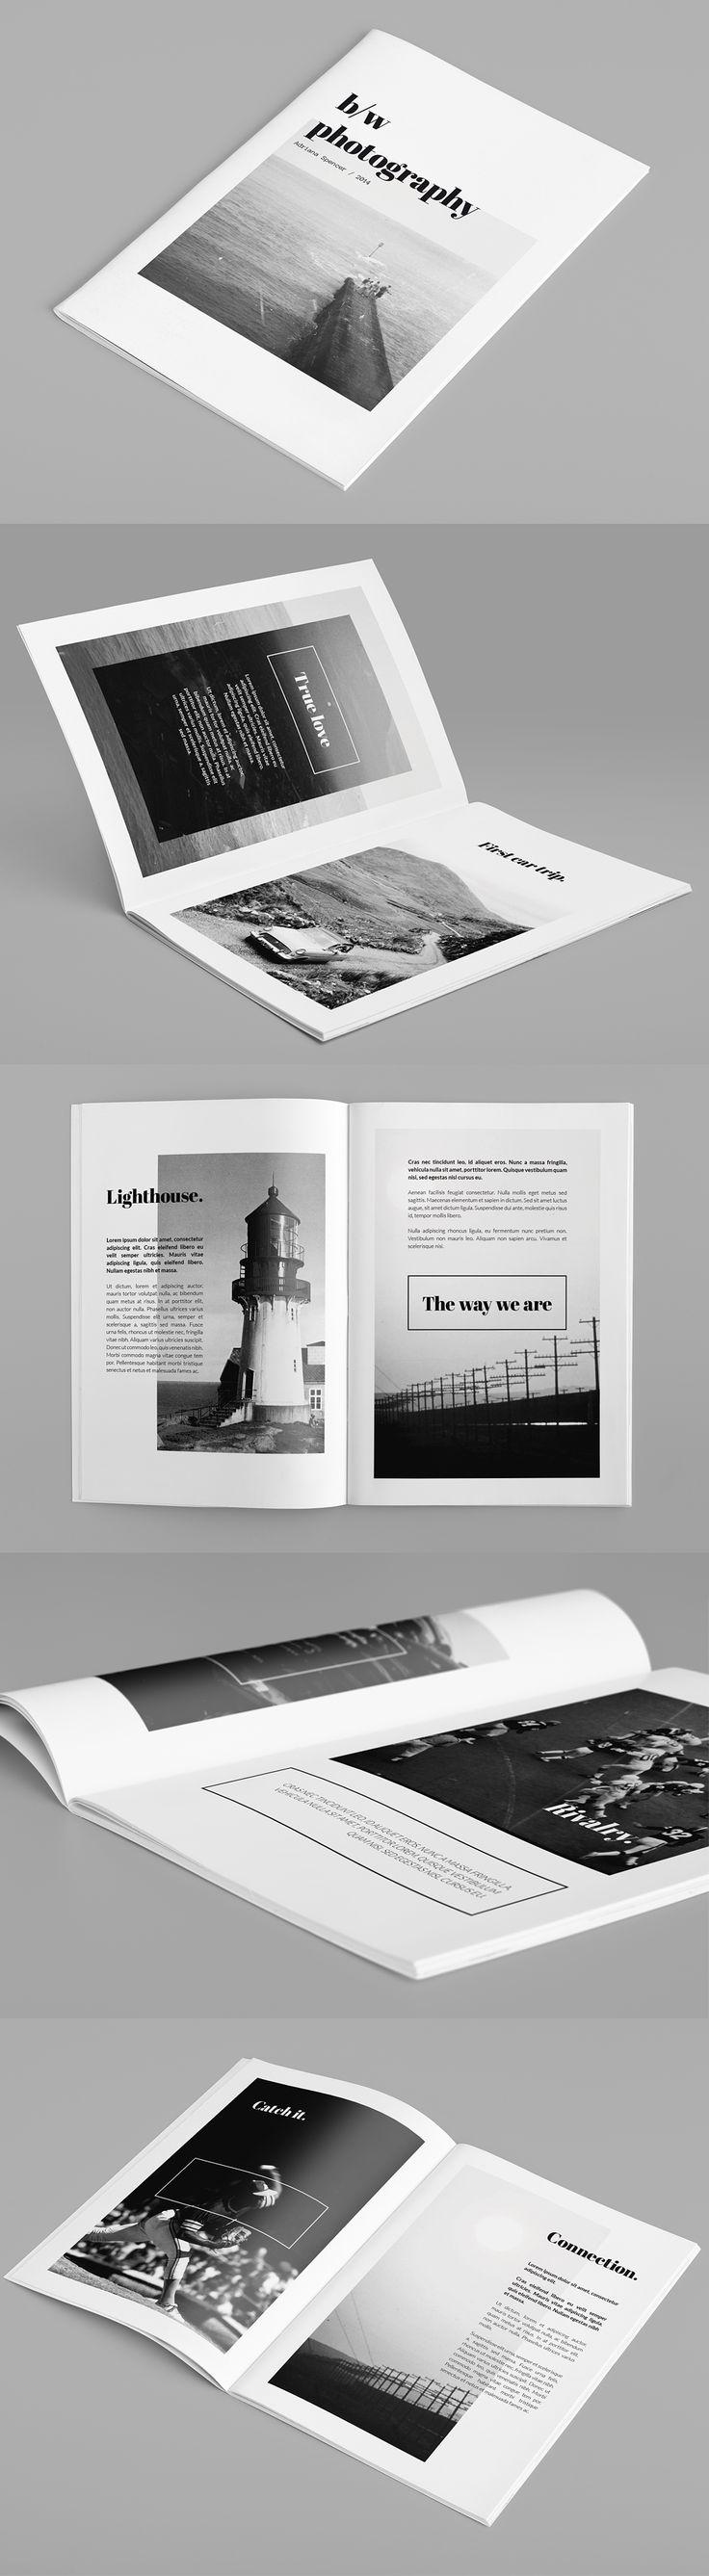 Minimal Photography Portfolio Brochure on Behance